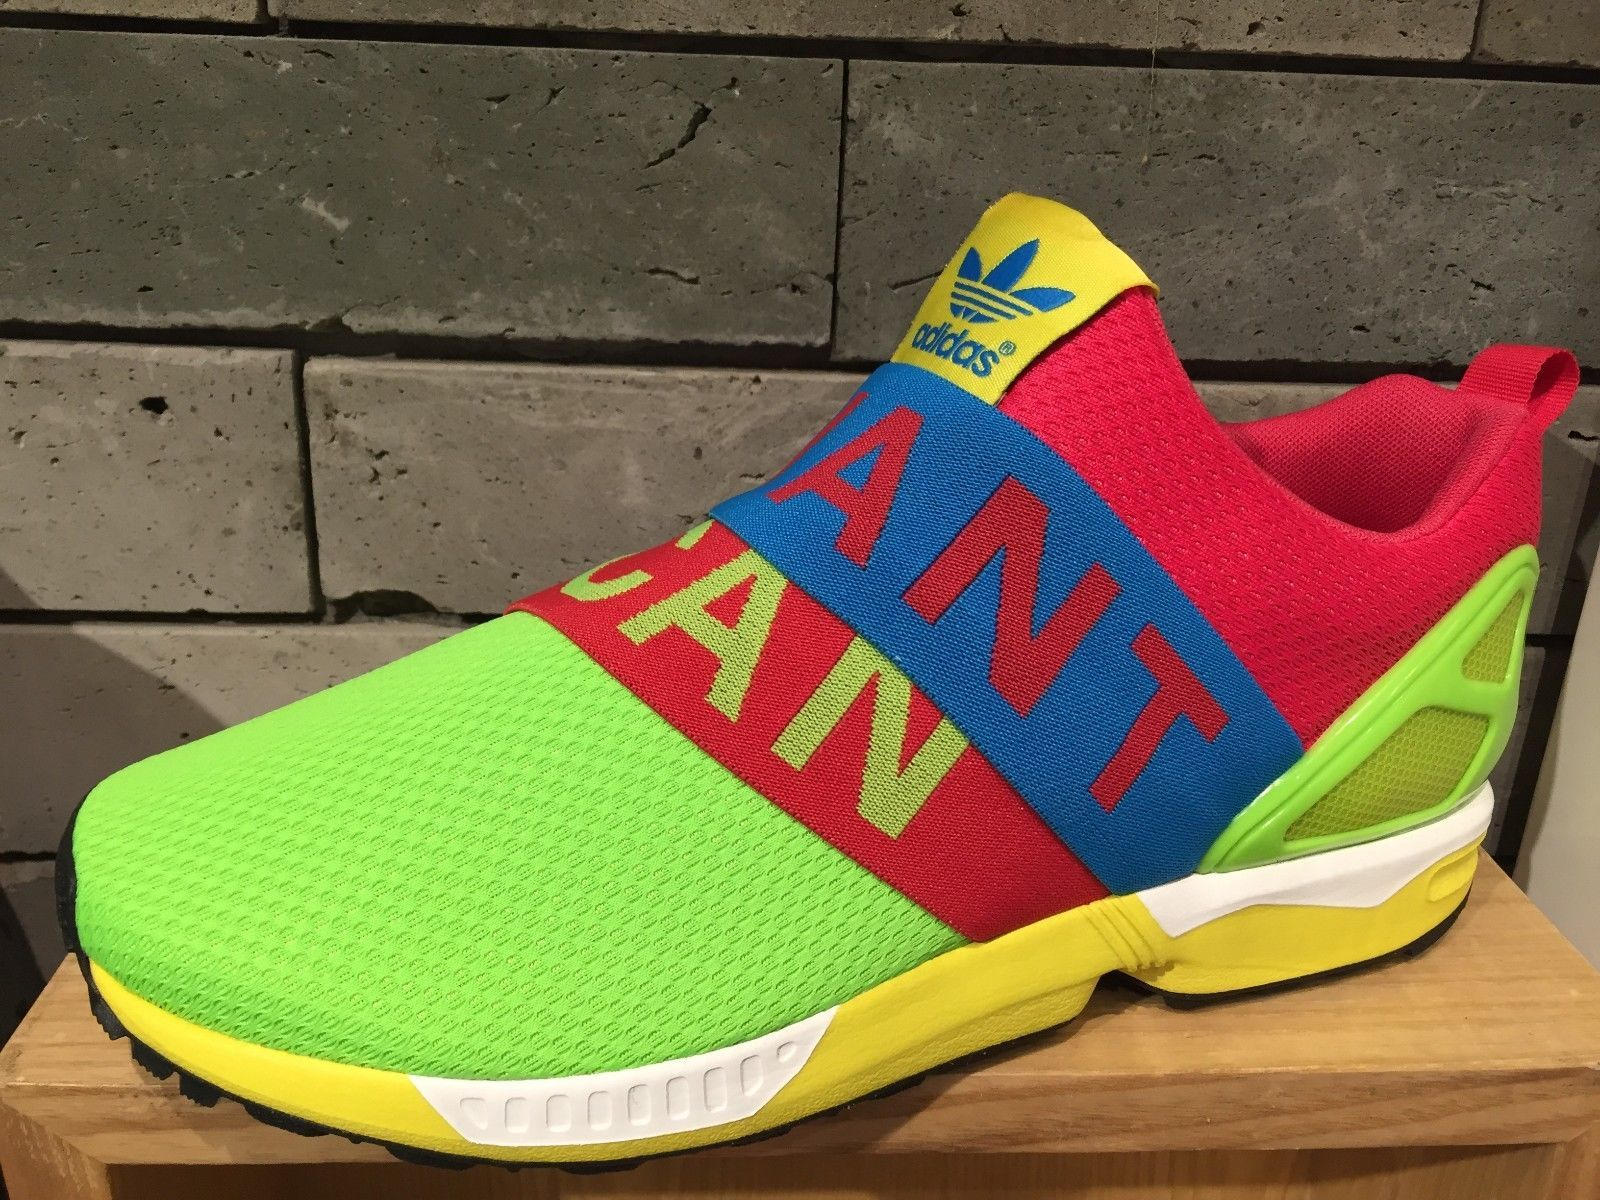 best sneakers 281b9 68313 New Adidas Originals ZX Flux Slip on Green Pink Blue B34451 ...